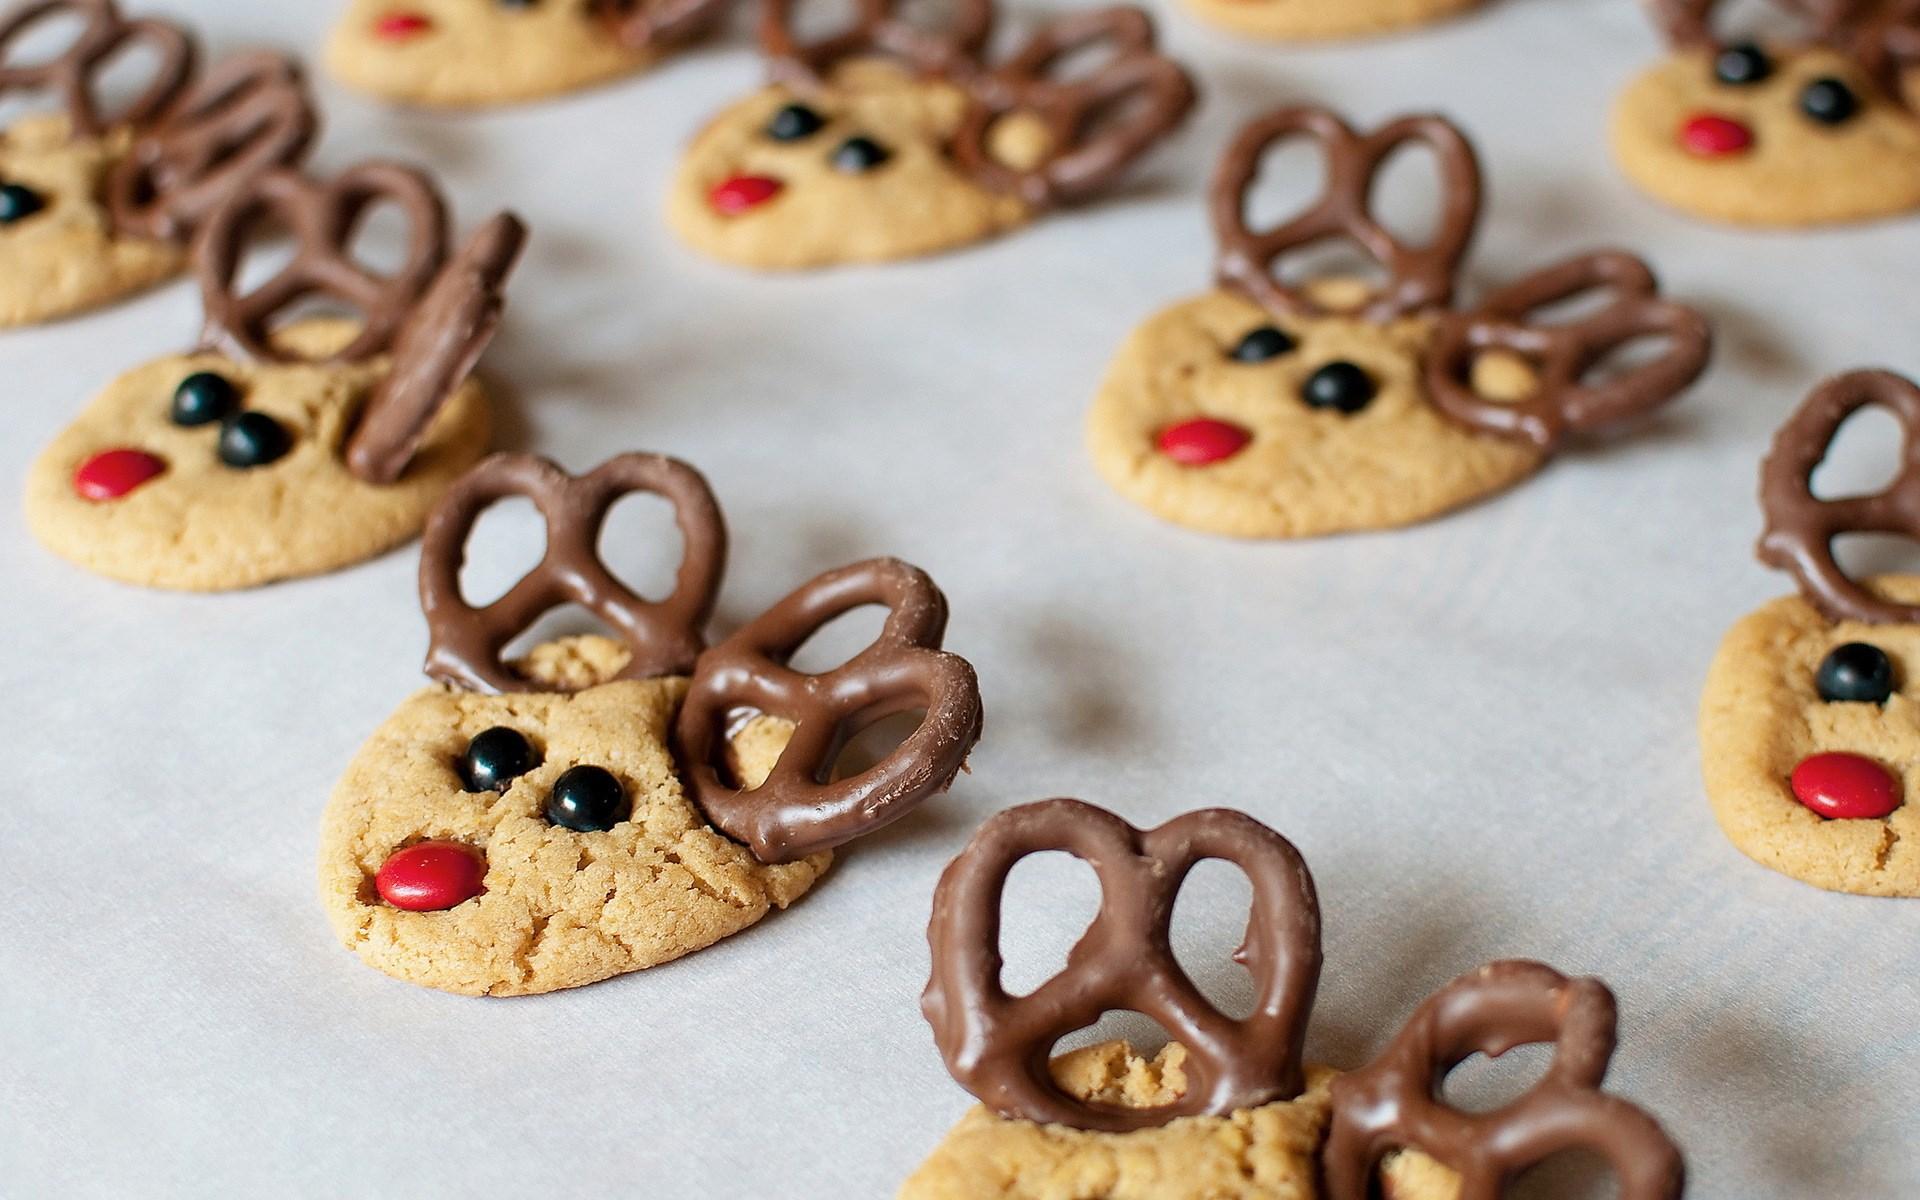 merry christmas wallpapers cookies hd